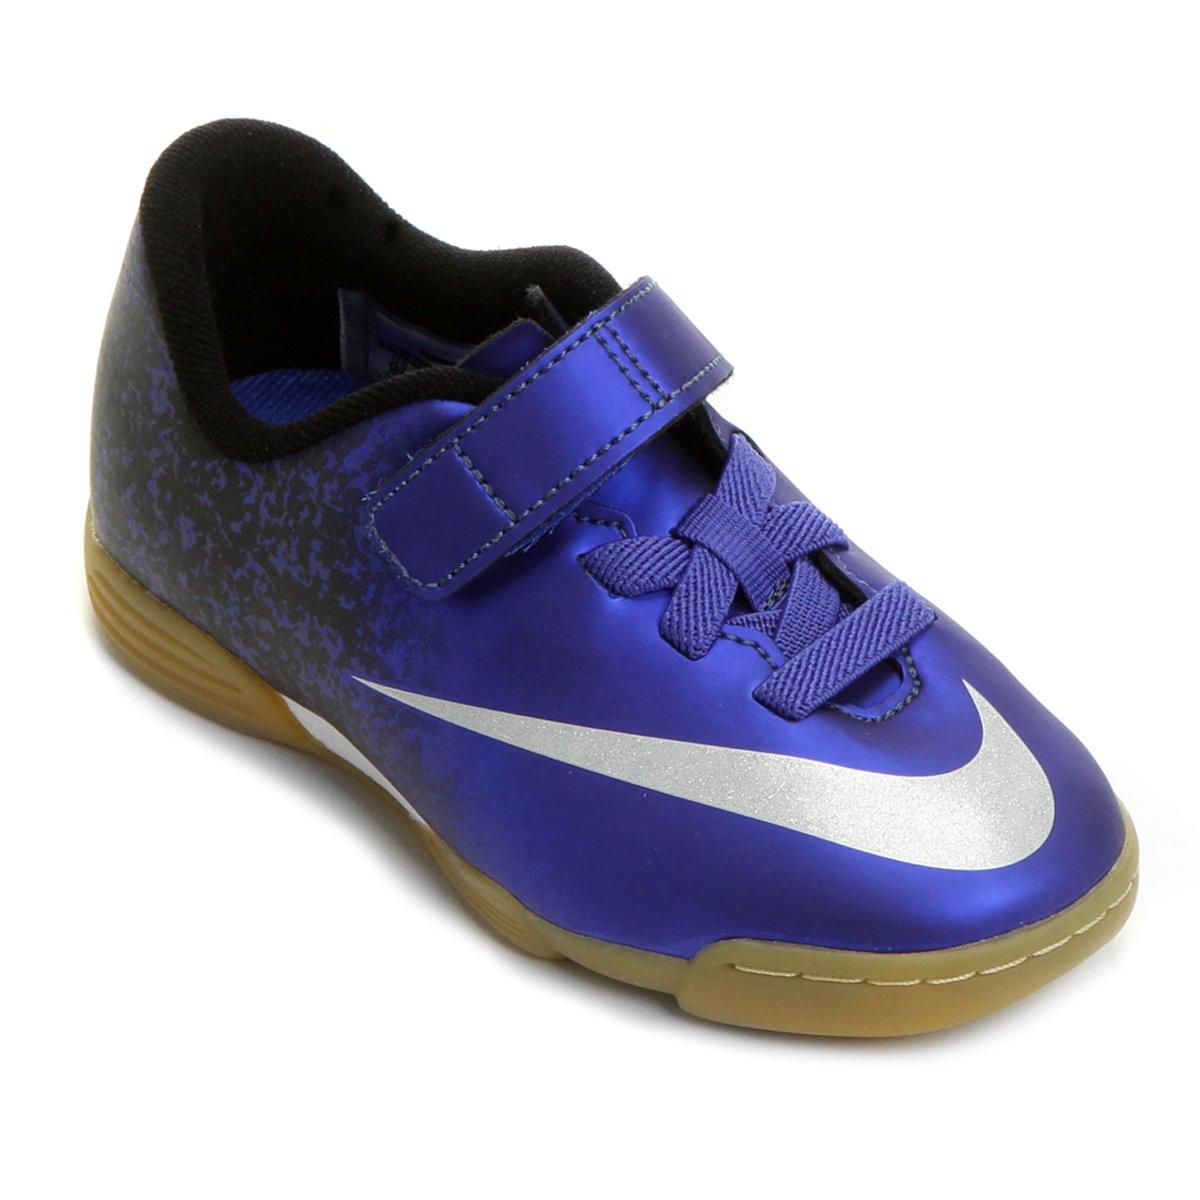 eb5b30e5fea25 Chuteira Nike Mercurial Vortex 2 (V) CR7 IC Futsal Infantil - Compre Agora